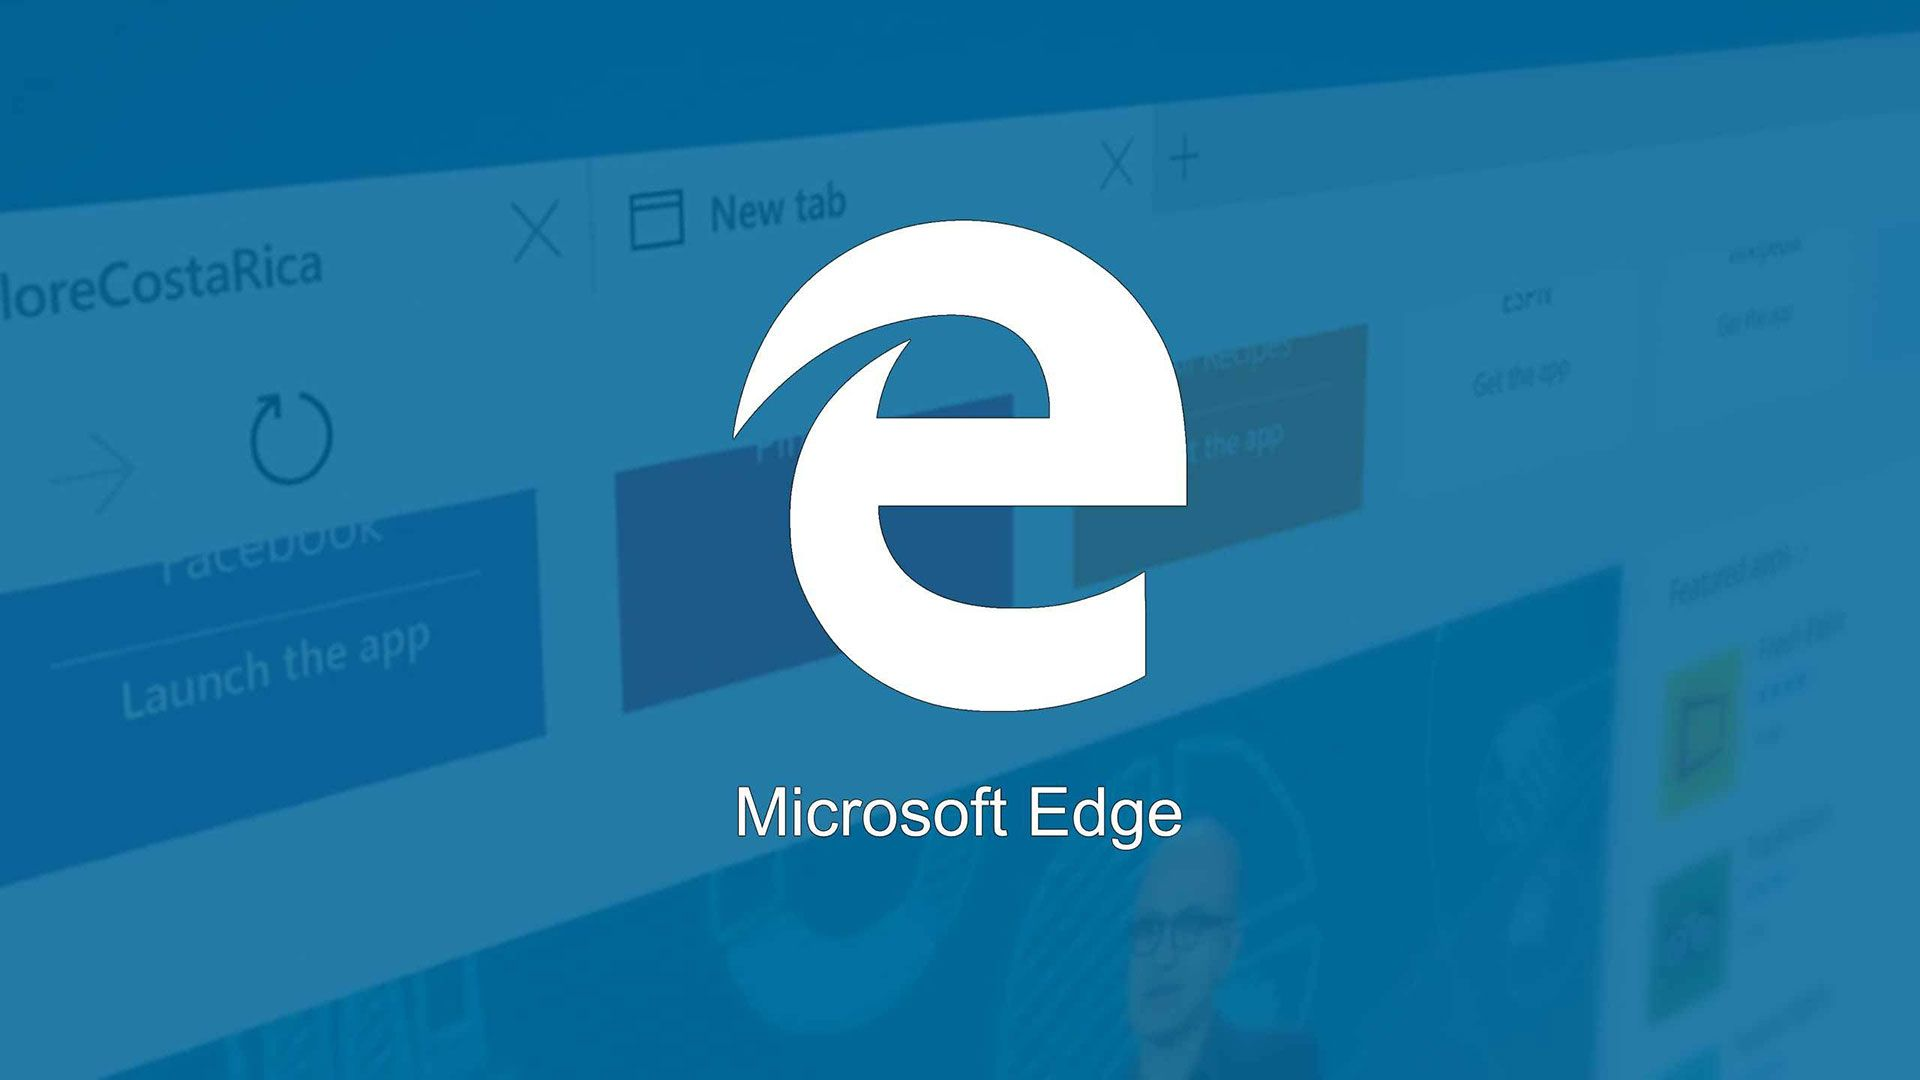 Microsoft edge vignette